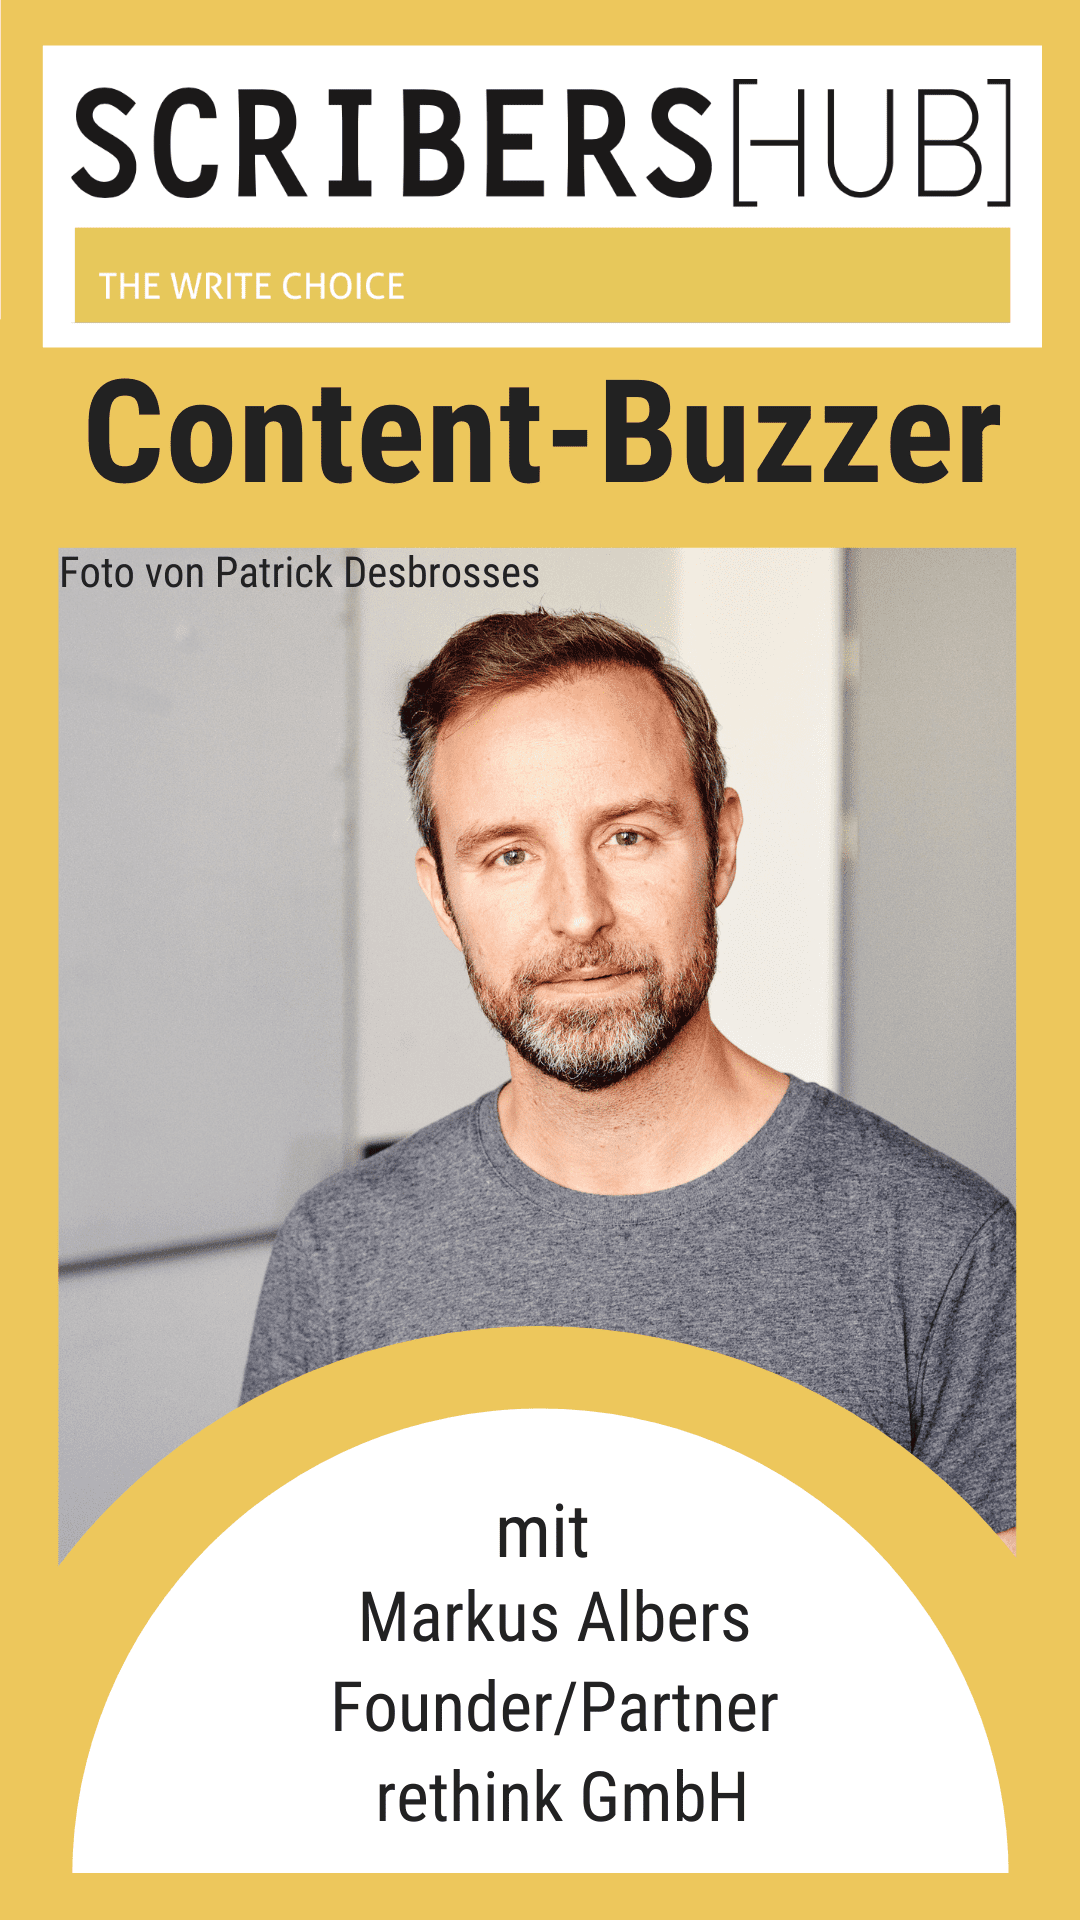 Markus Albers im Content-Buzzer